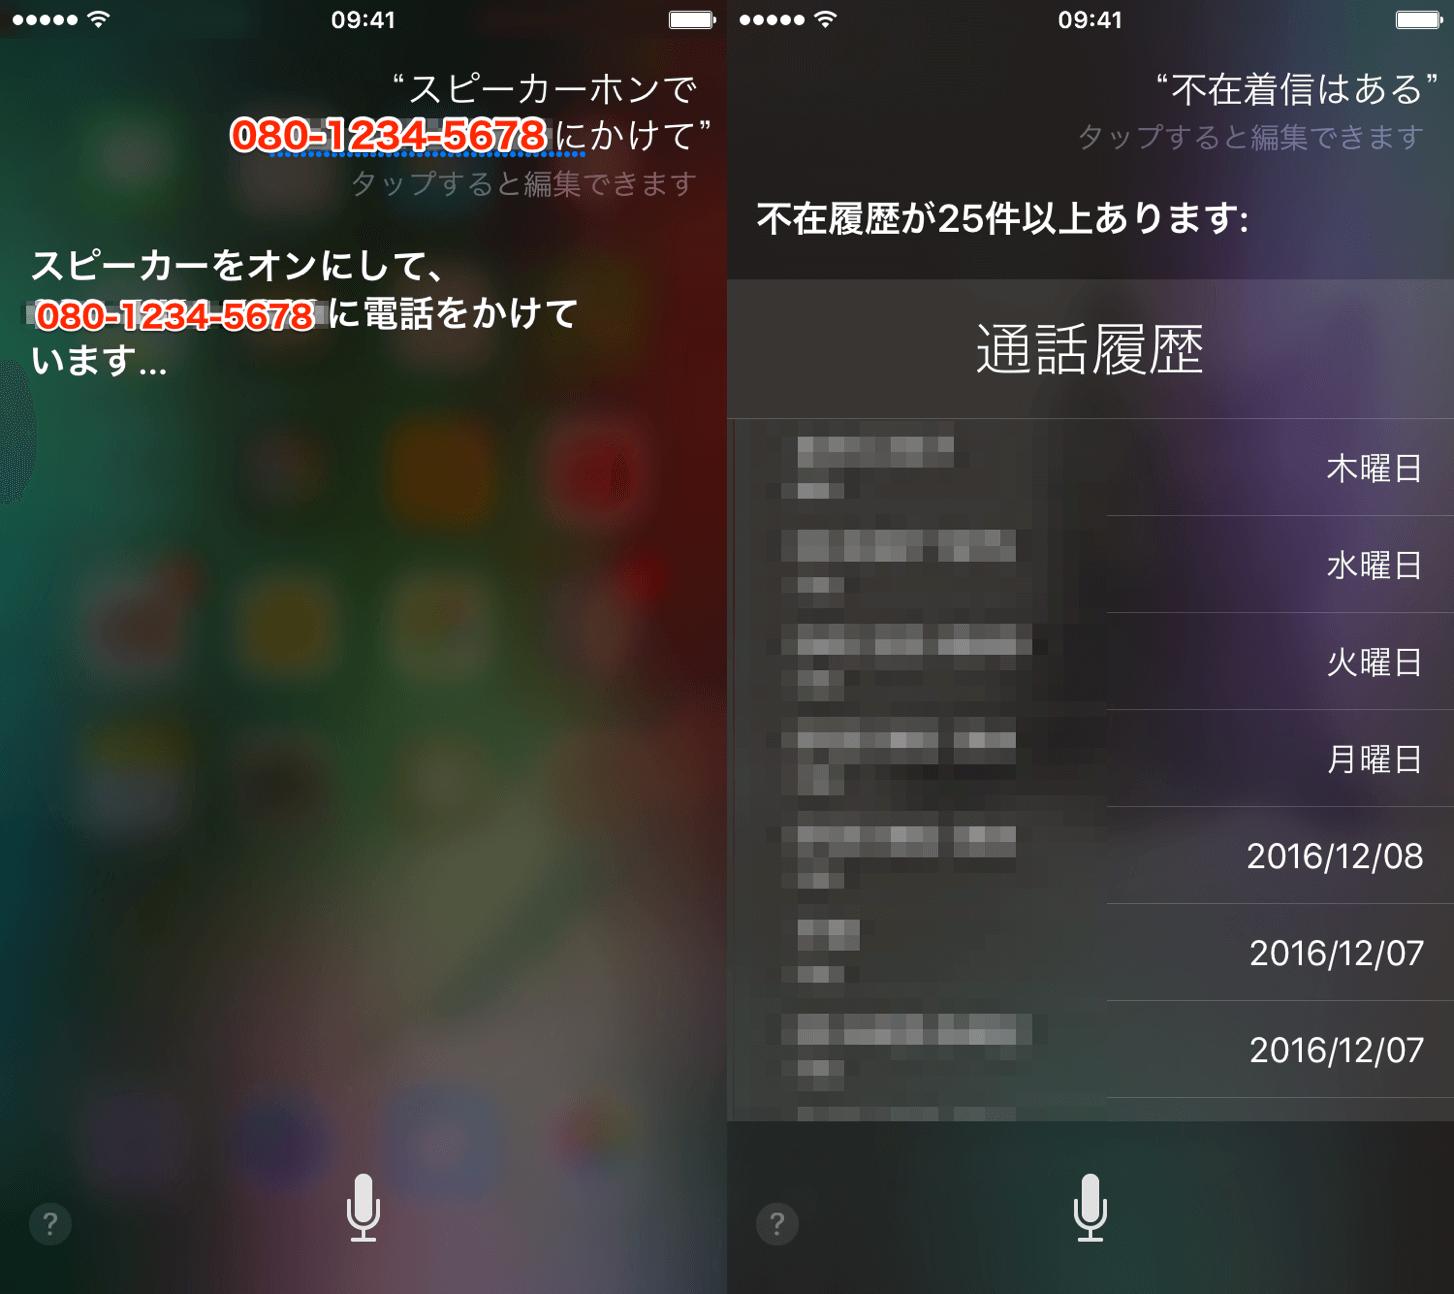 Siri 電話 不在着信